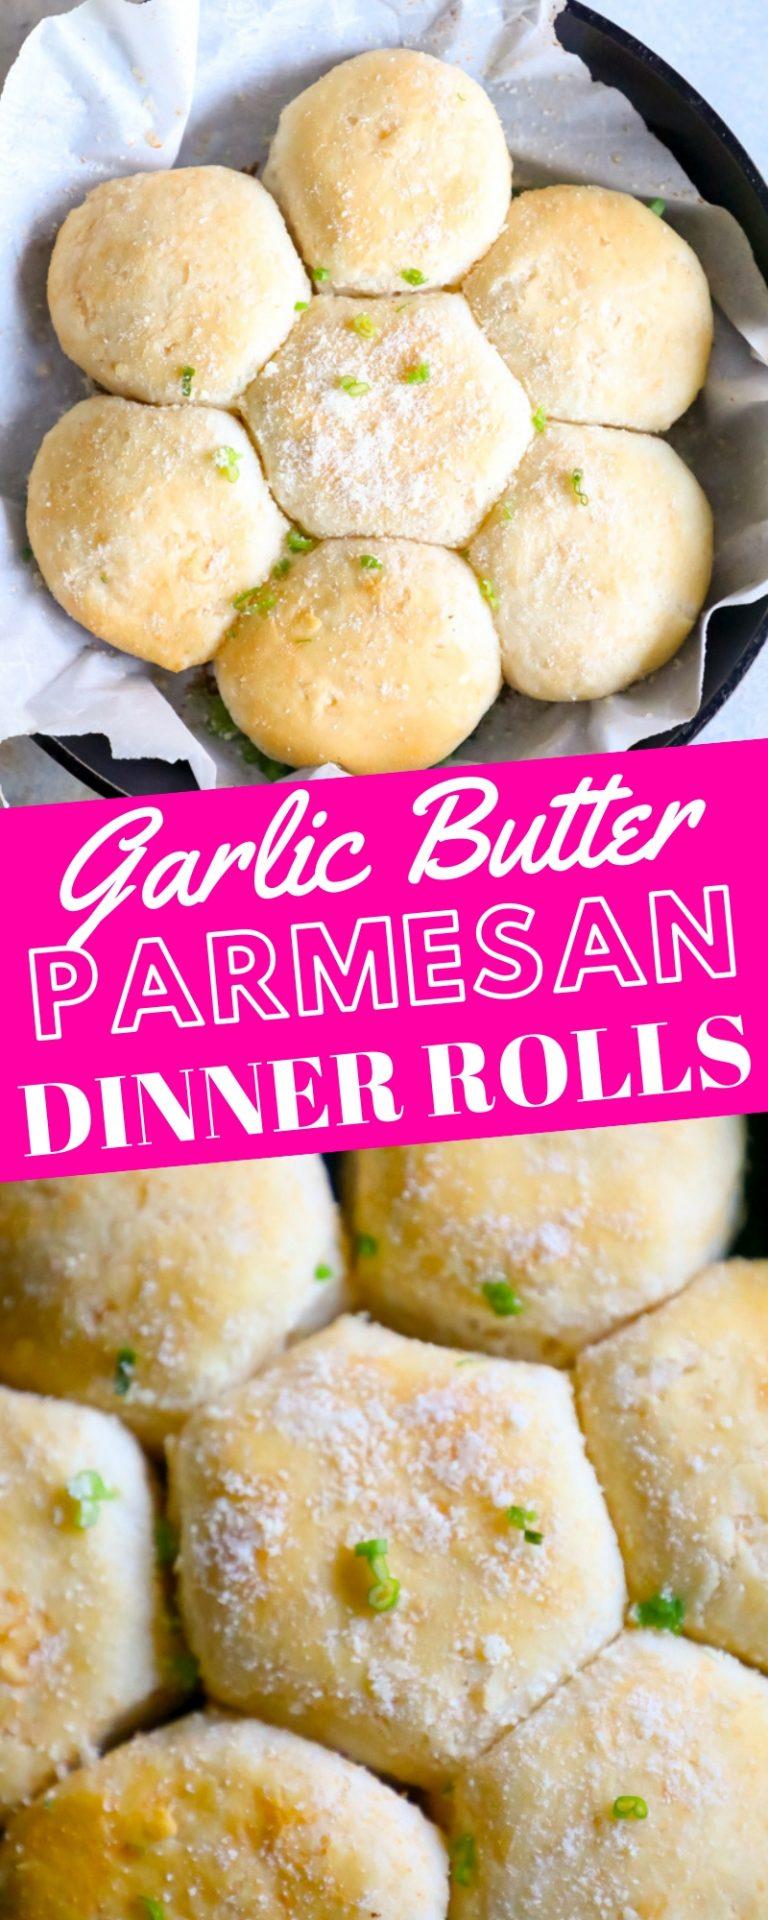 Easy Garlic Butter Texas Toast Recipe - Sweet Cs Designs